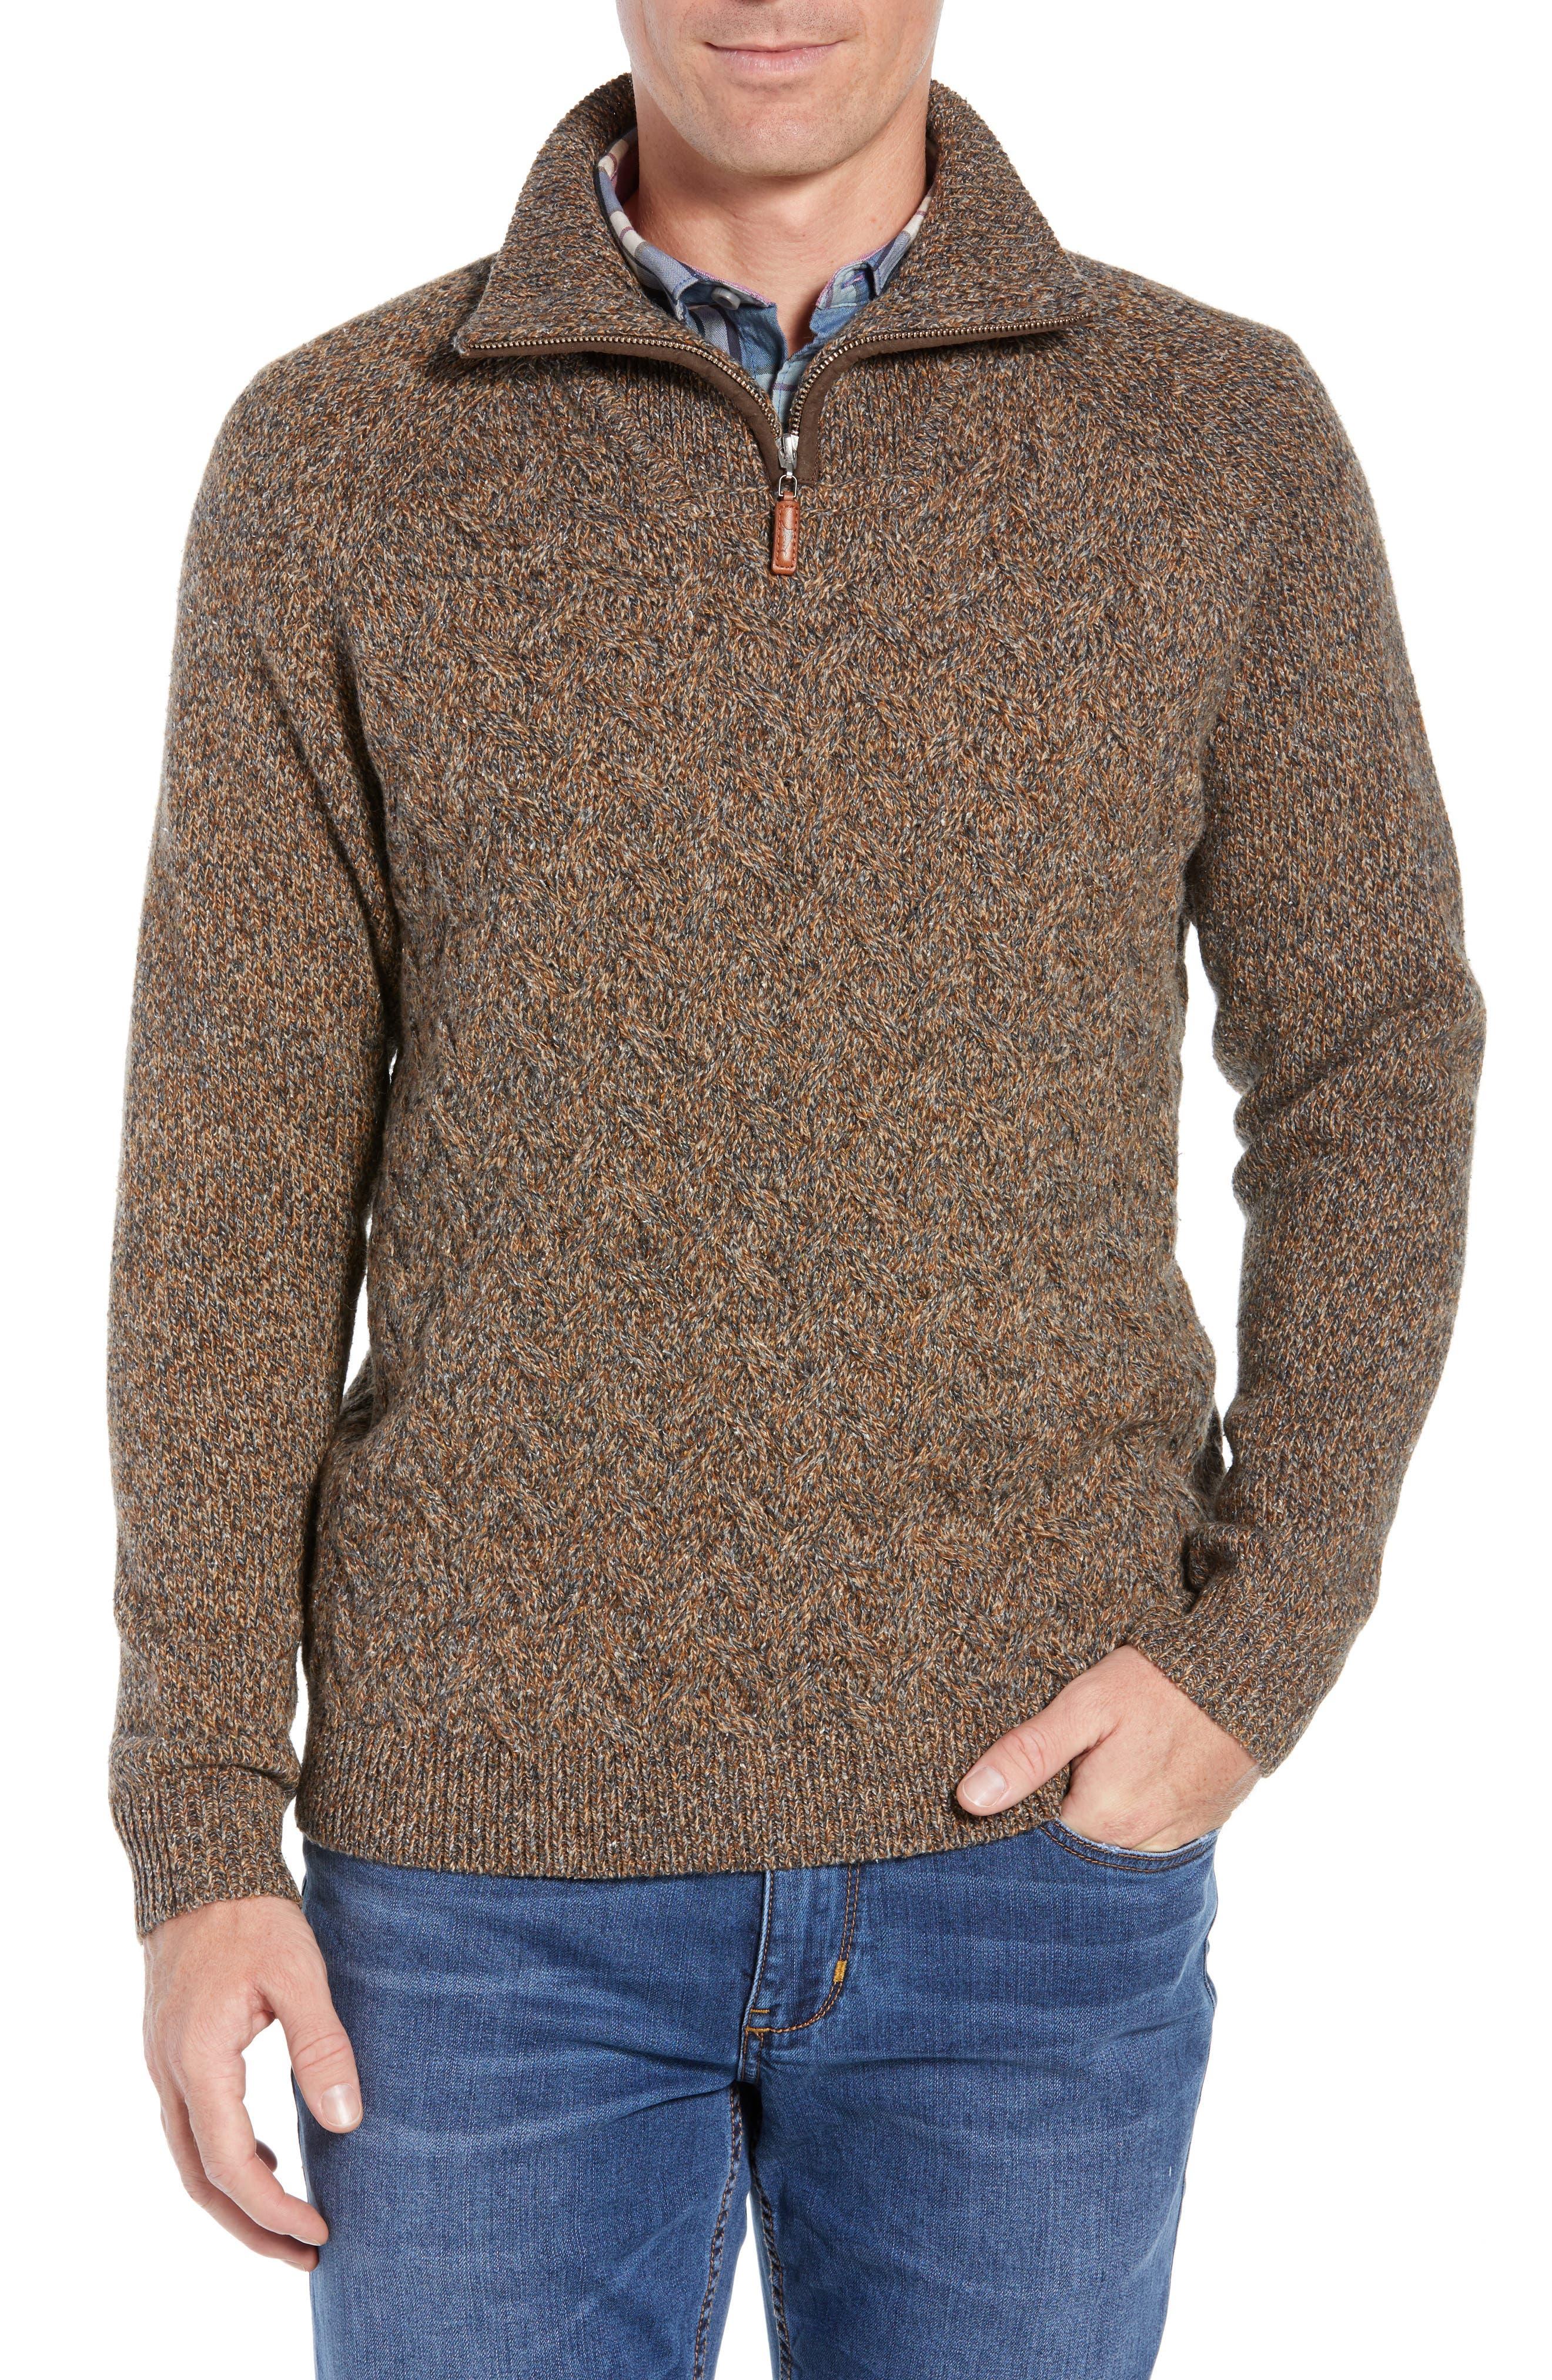 Irazu Half Zip Sweater,                         Main,                         color, 201